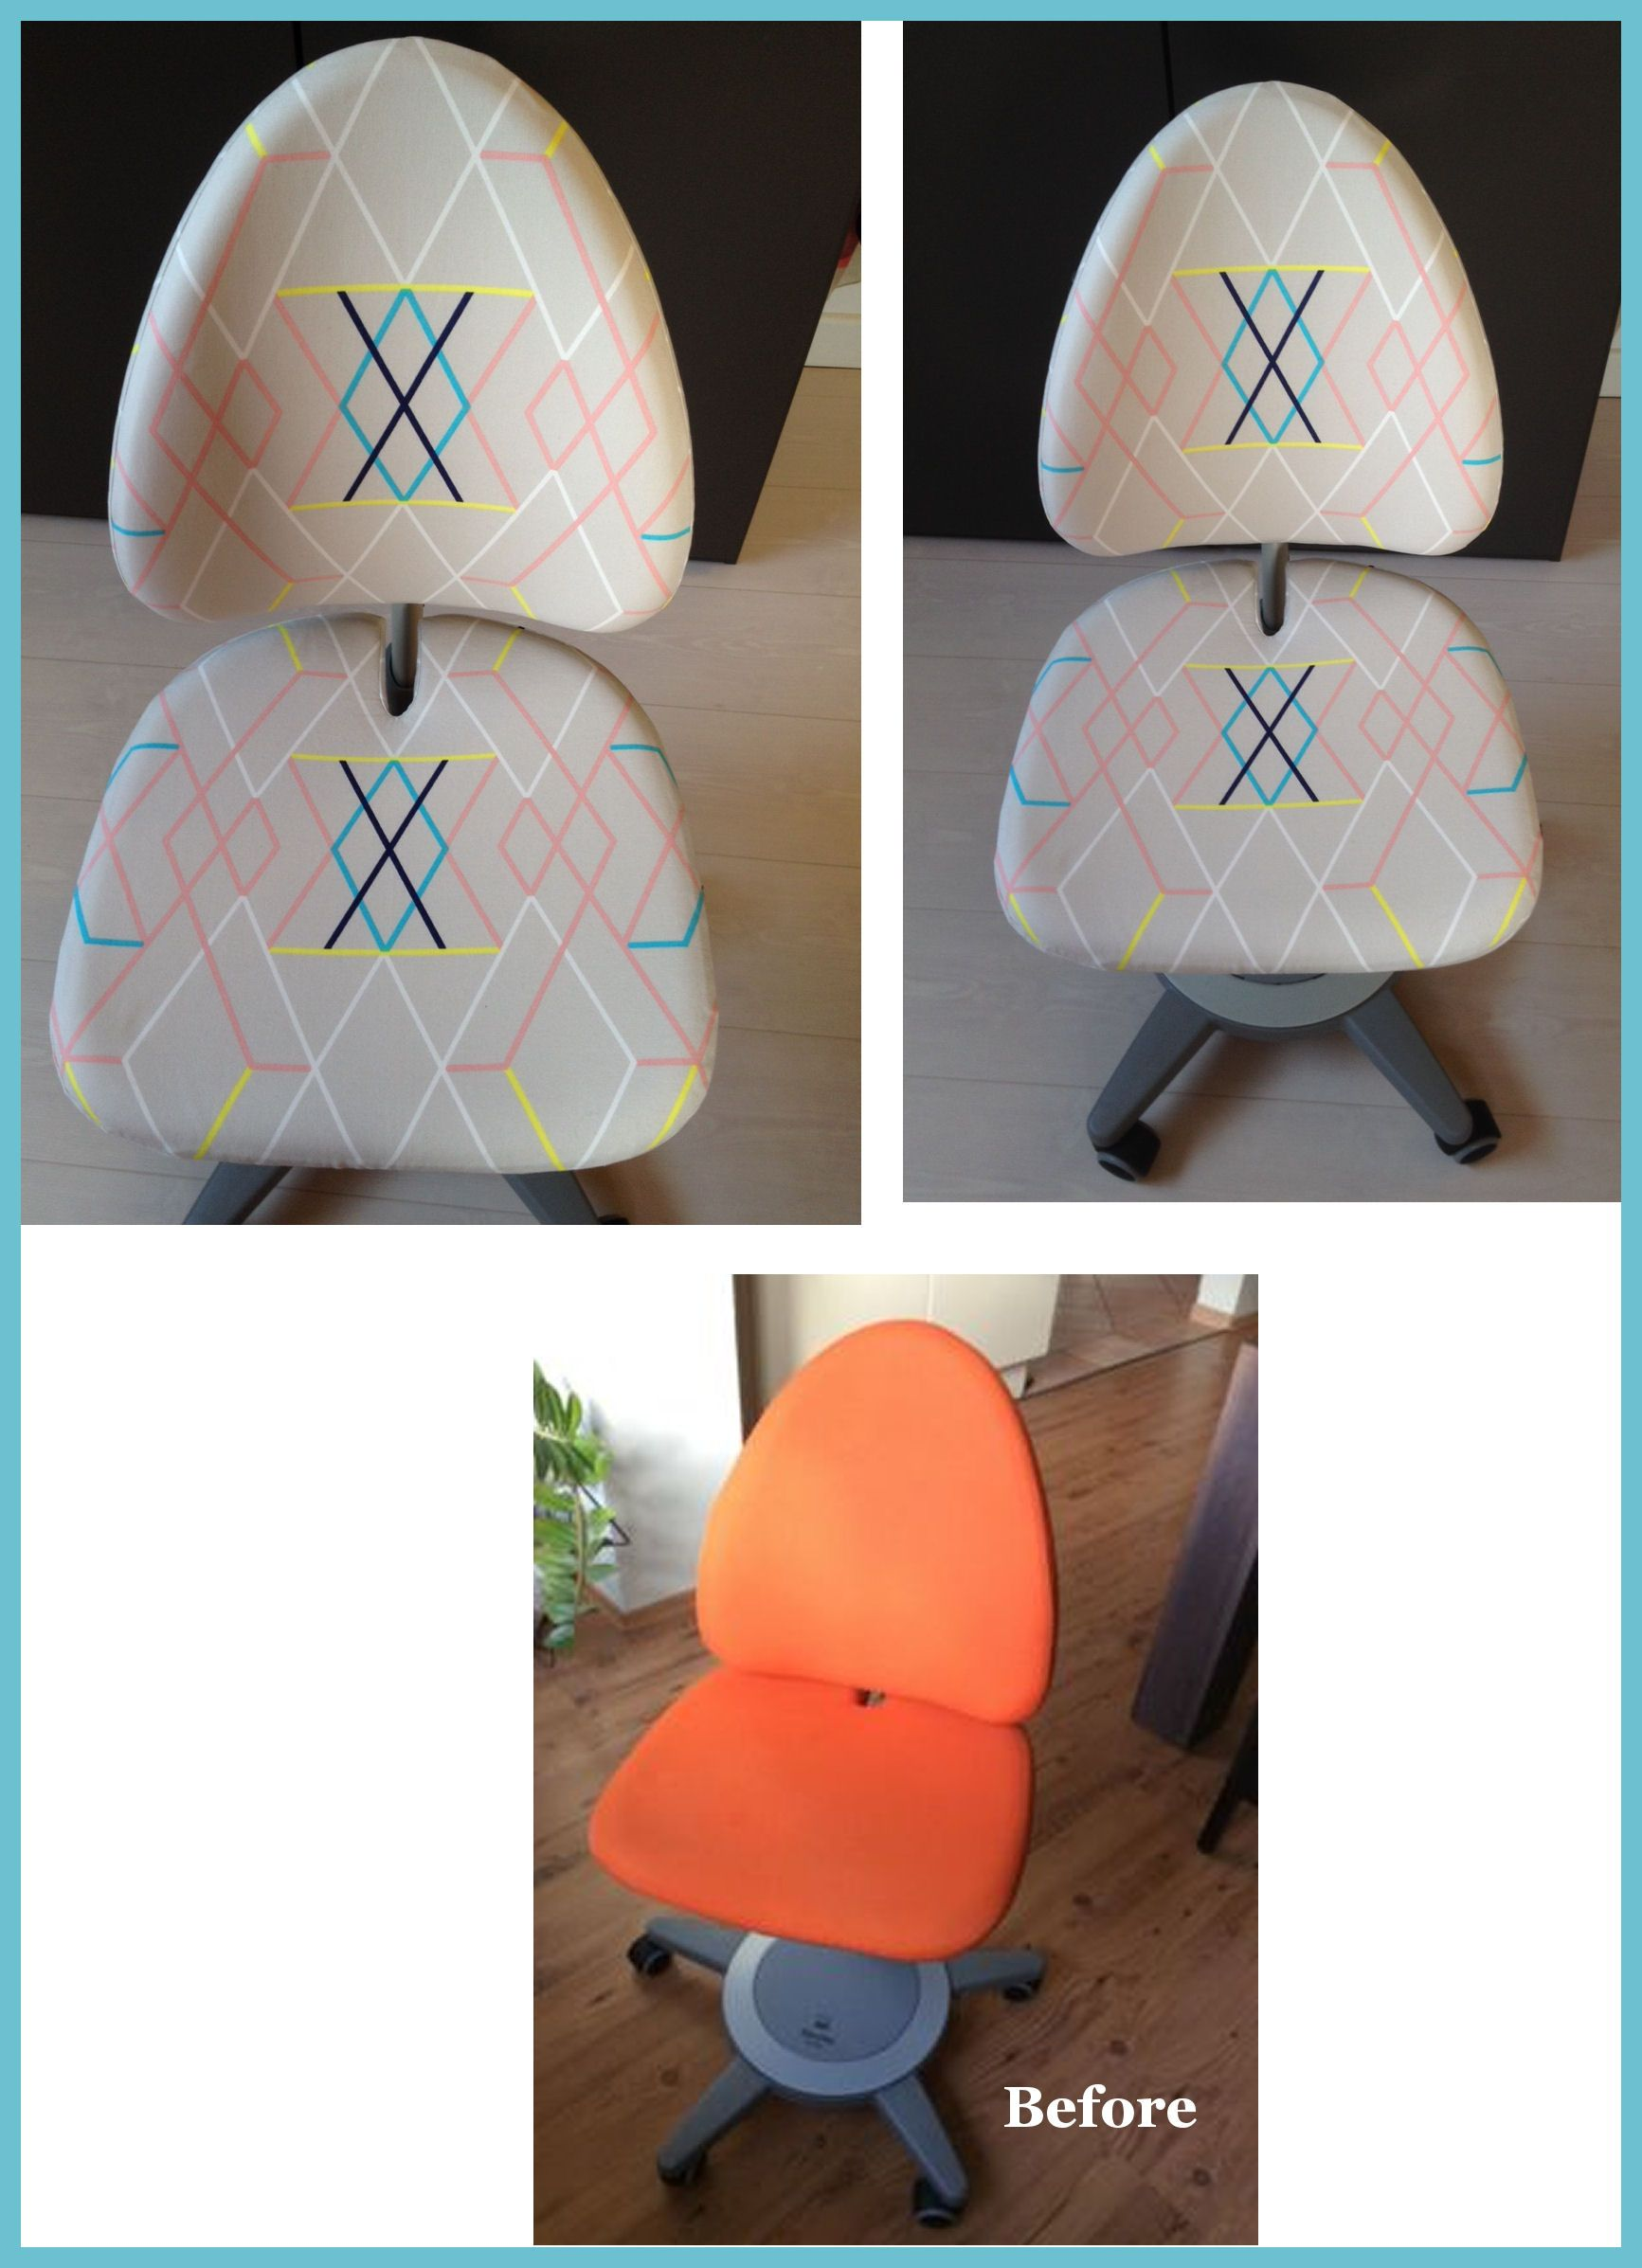 Moll Maximo Forte Desk Chair With Ikea PS 2014 Fabric Covers. / MOLL  Schreibtischdrehstul Maximo